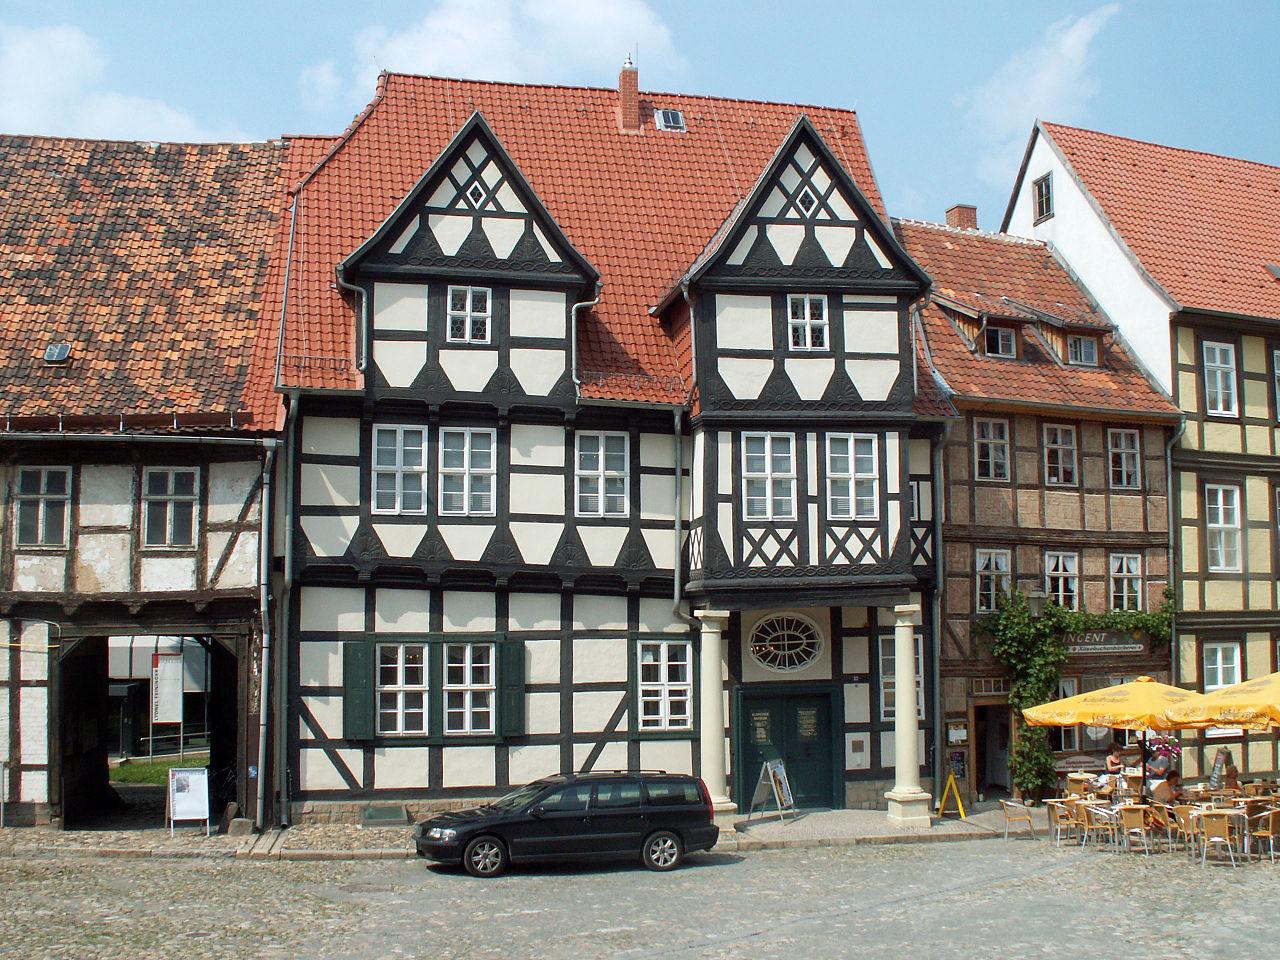 Bild Klopstockhaus Quedlinburg